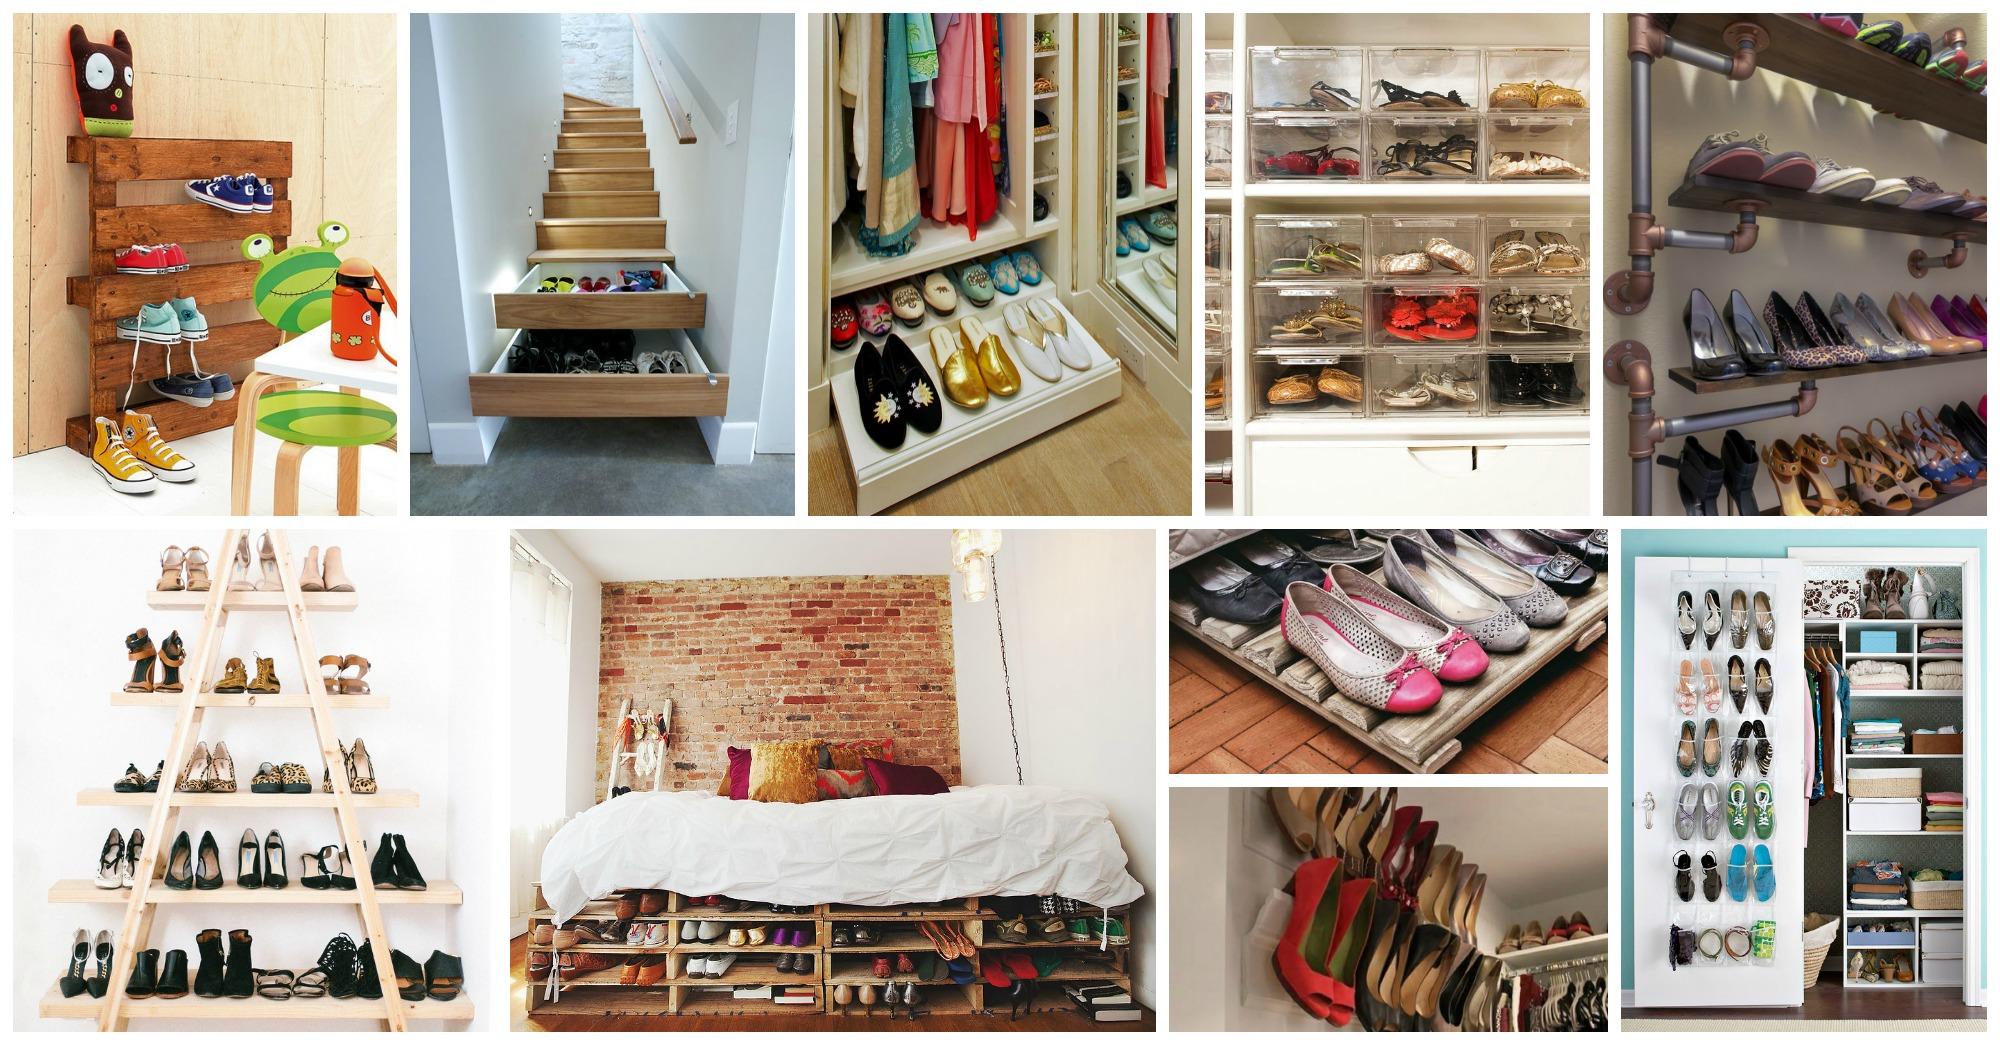 20+ Creative Shoe Storage Ideas That Will Impress You